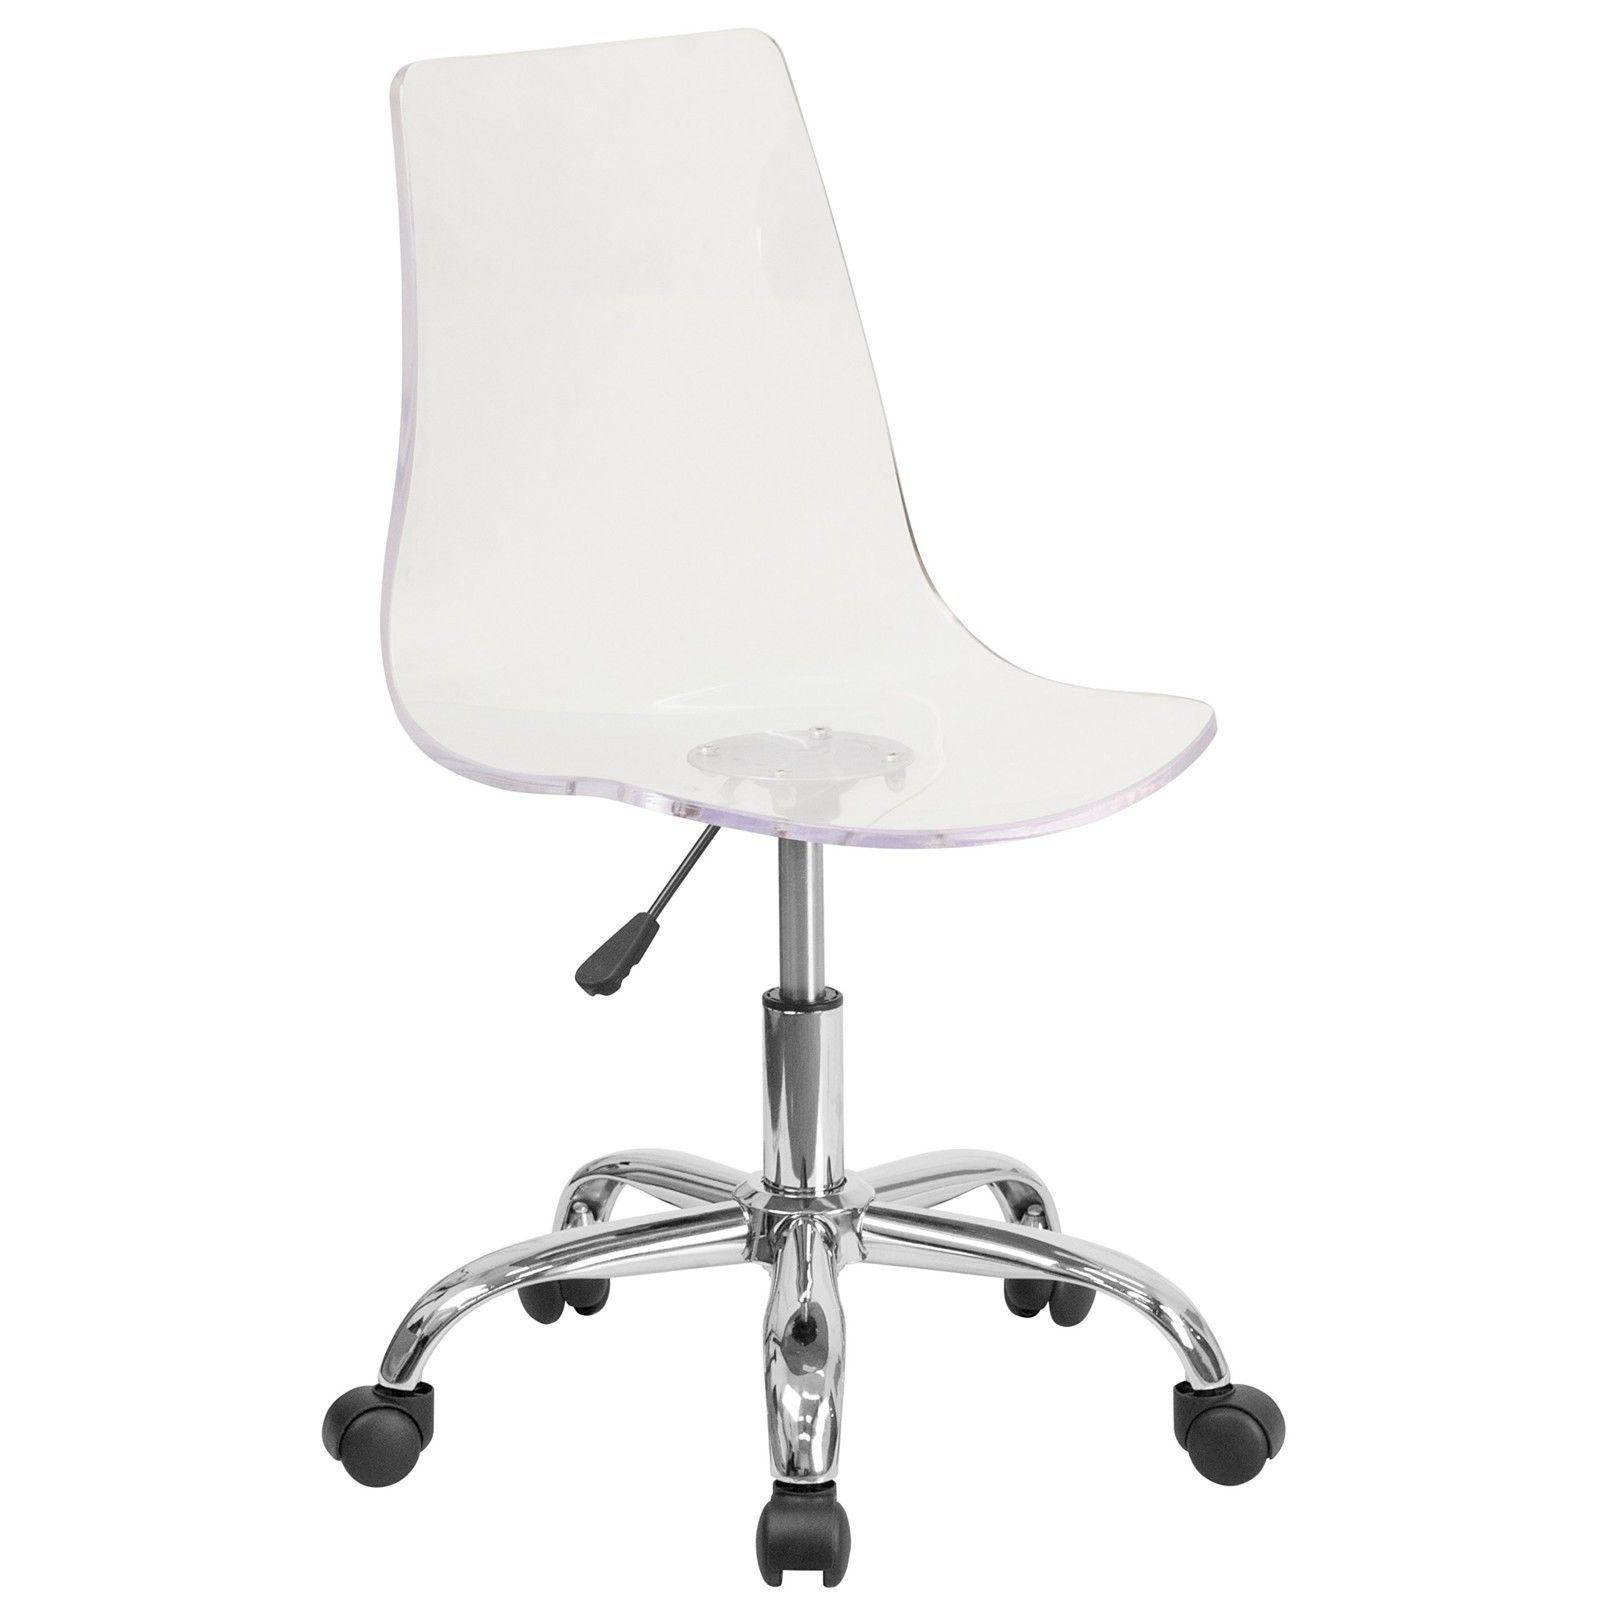 Adjustable Clear Office Chair Task Seat Modern Rolling Desk Garage